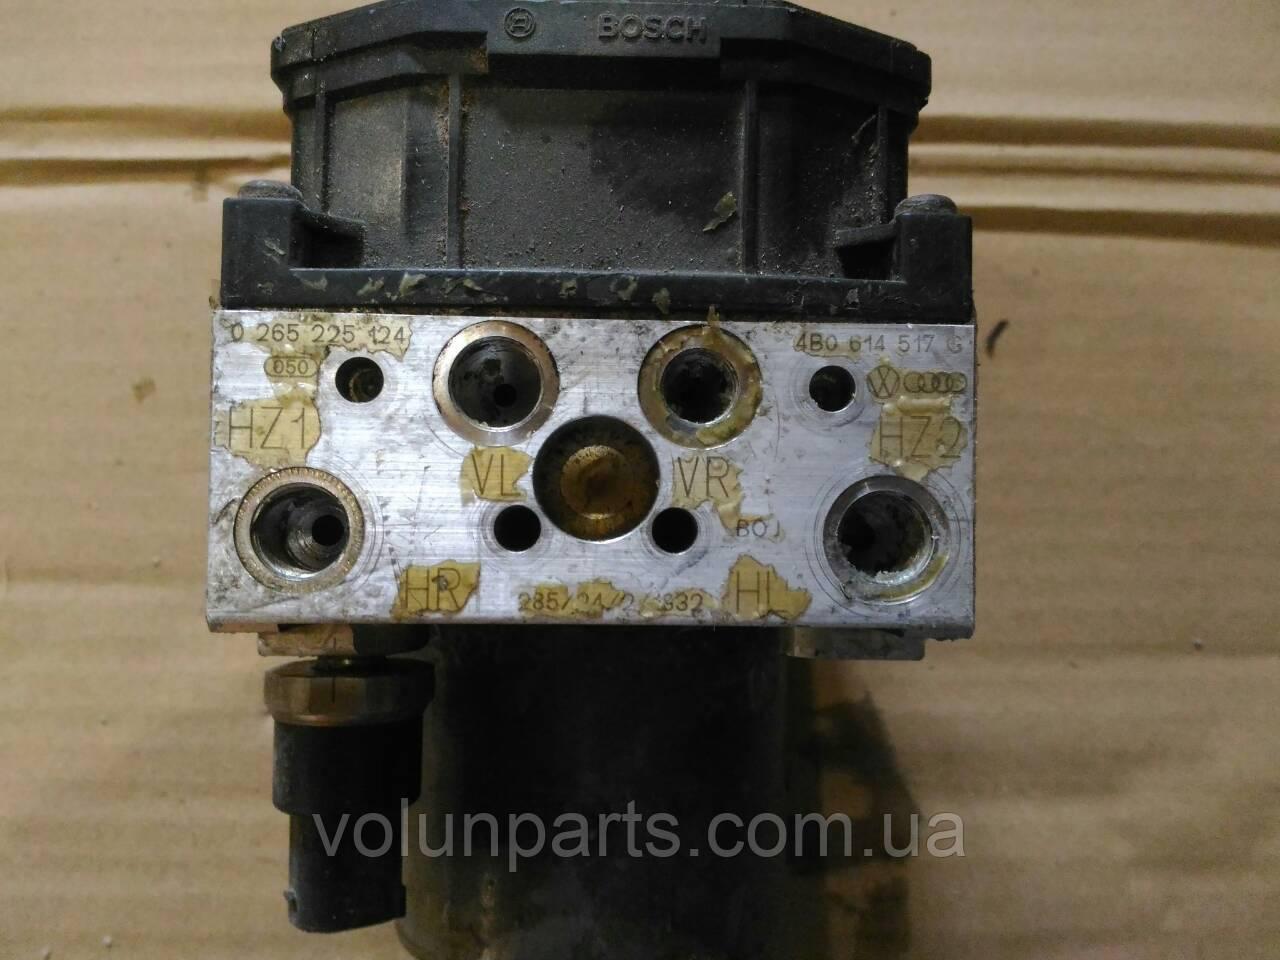 Б/У Блок ABS Audi A6C5/Passat B5 4b0614517G 0265225124